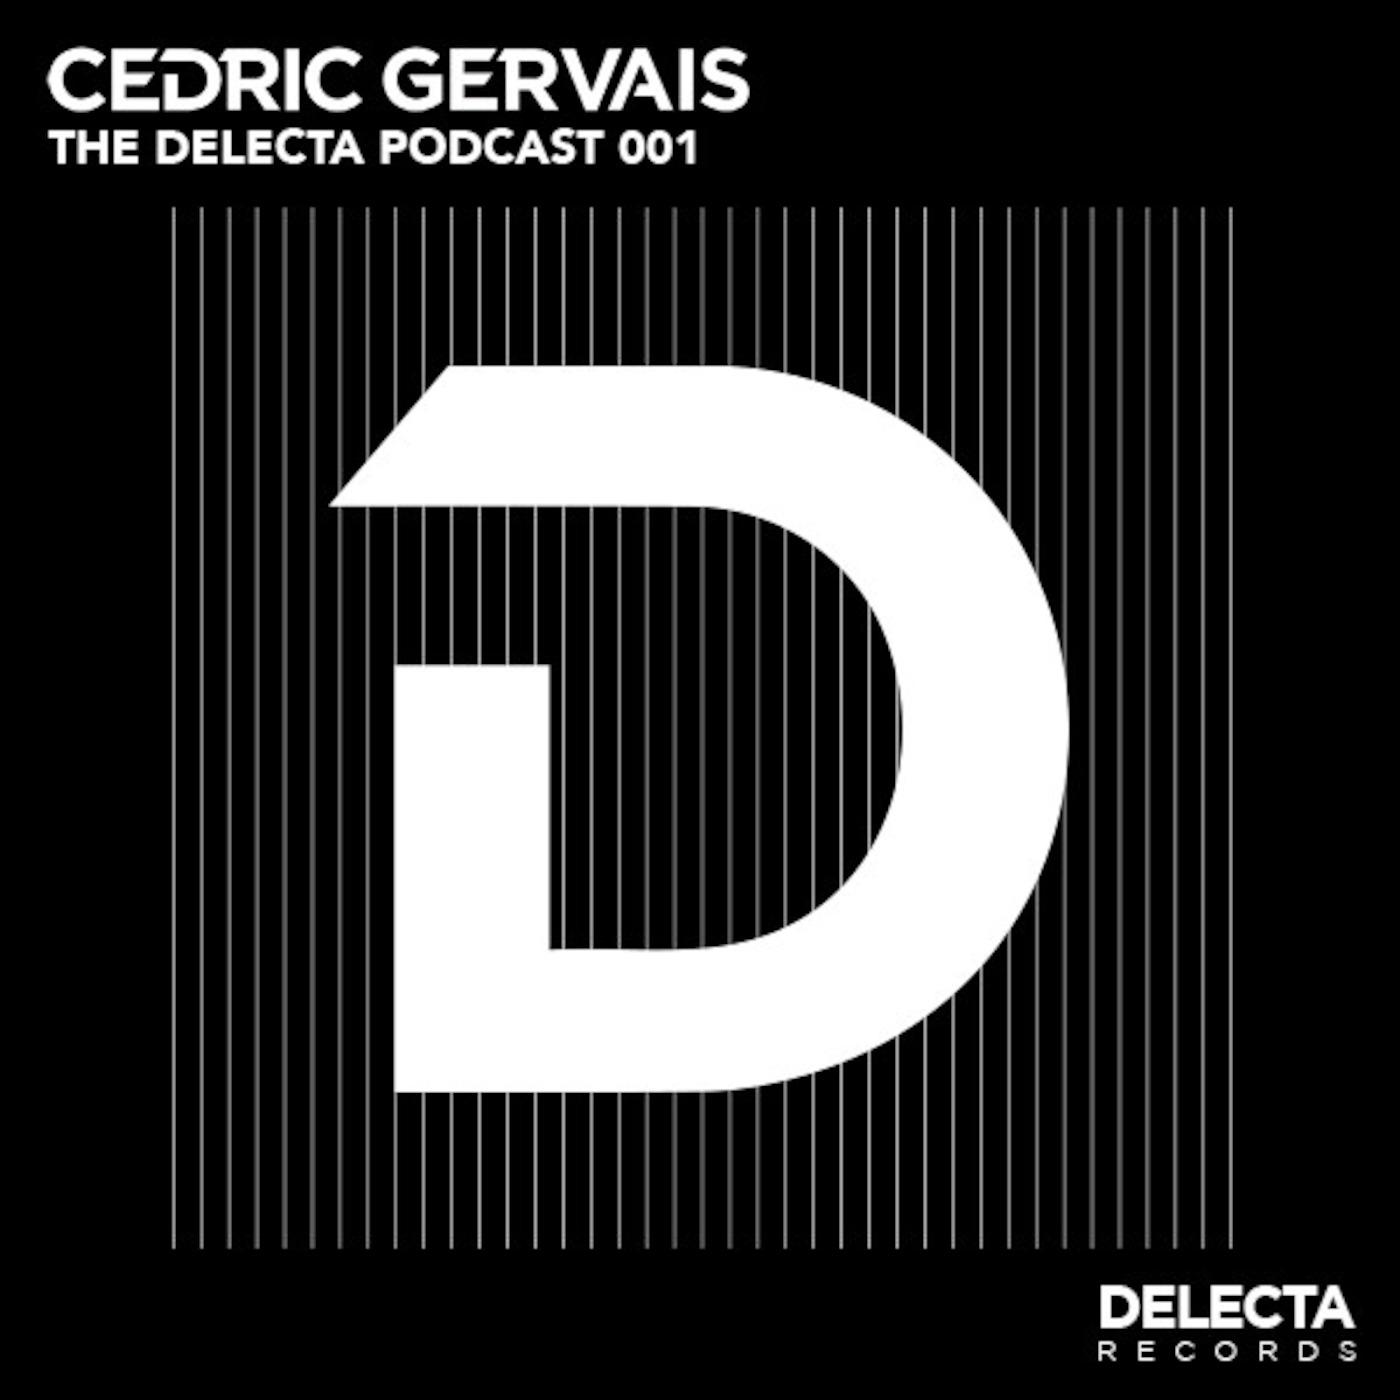 Cedric Gervais Presents: The Delecta Podcast